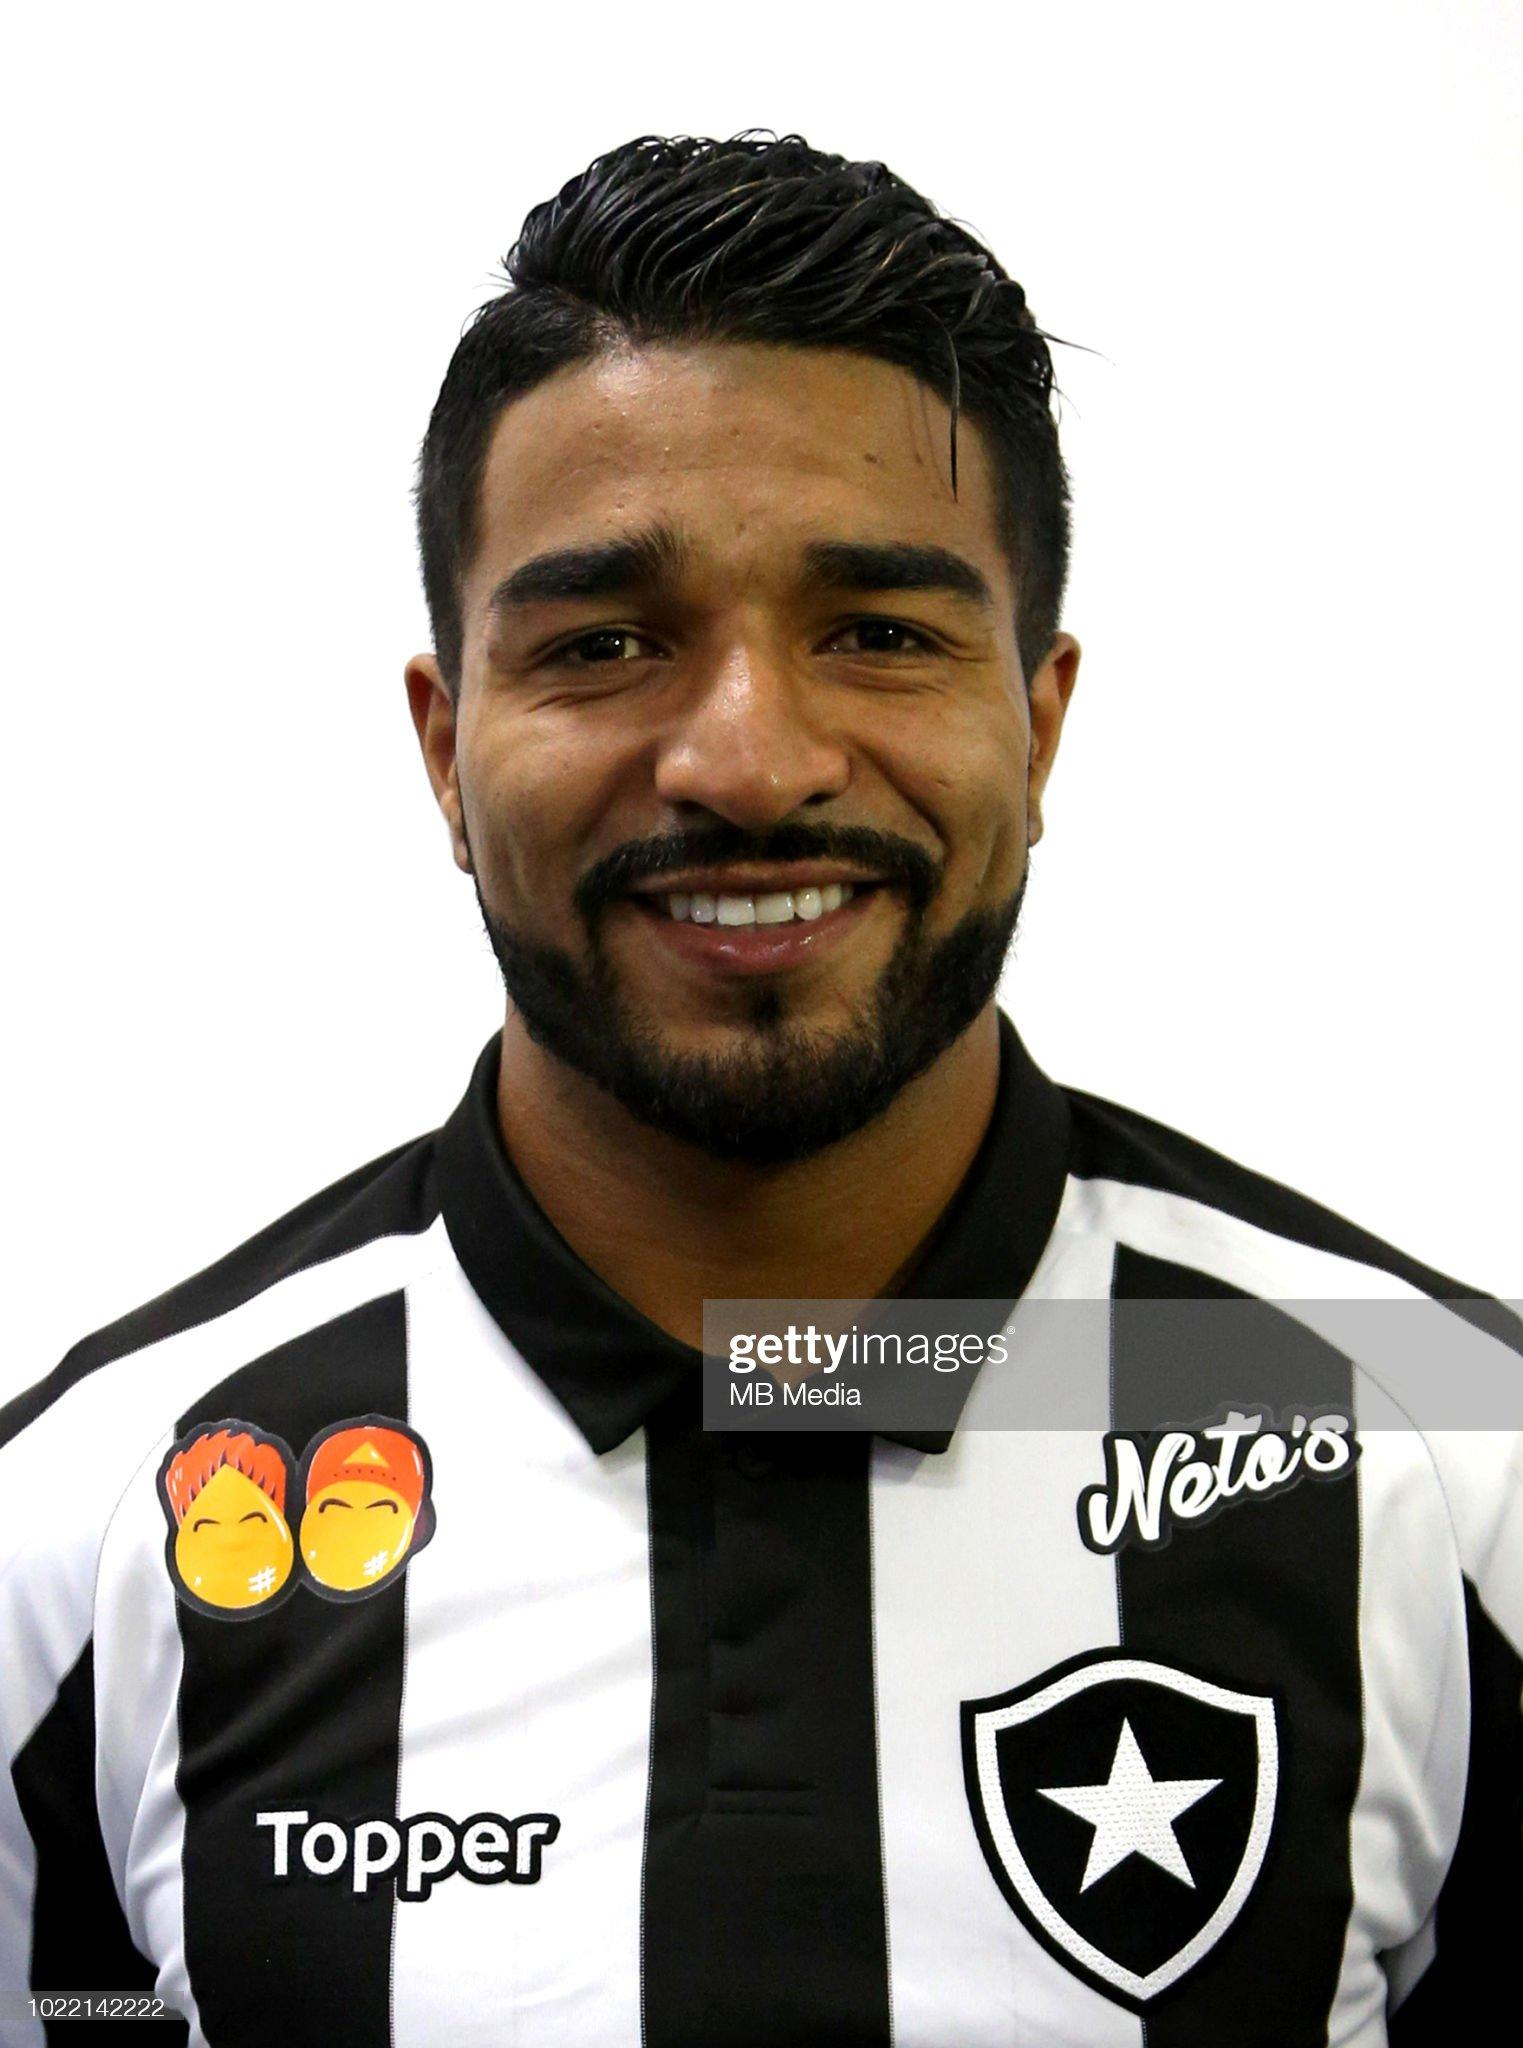 https://media.gettyimages.com/photos/brazilian-football-league-serie-a-2018-n-nrodrigo-sebastian-aguirre-picture-id1022142222?s=2048x2048